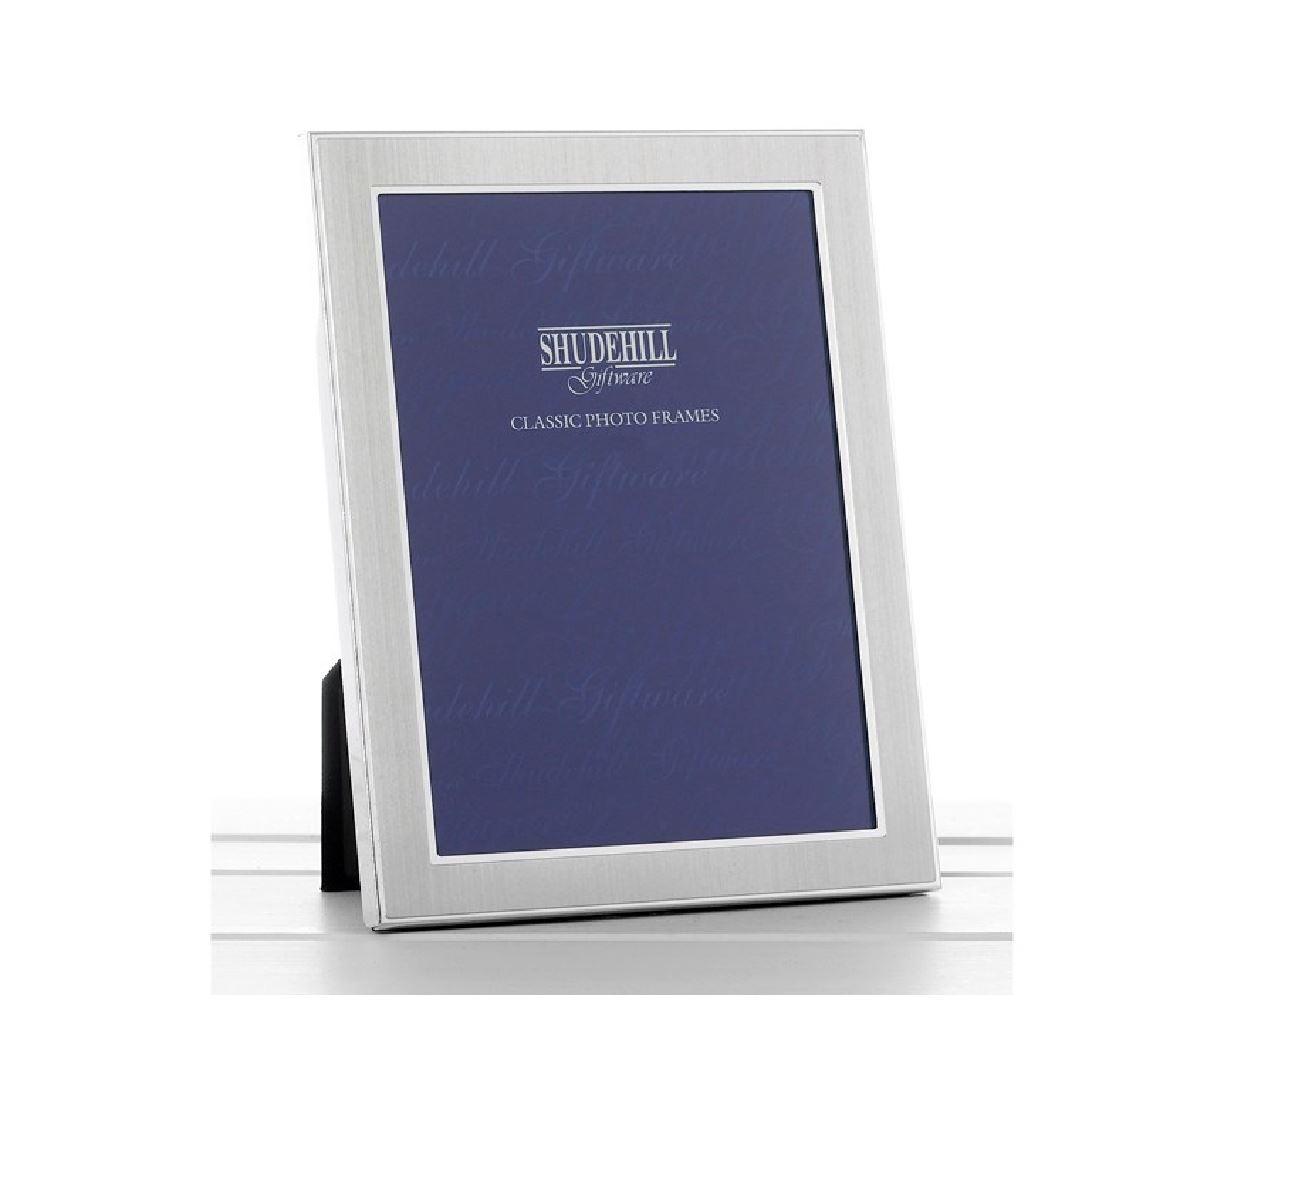 Liso plata satinada foto marco Shudehill Photo Frame 6 X 8   eBay